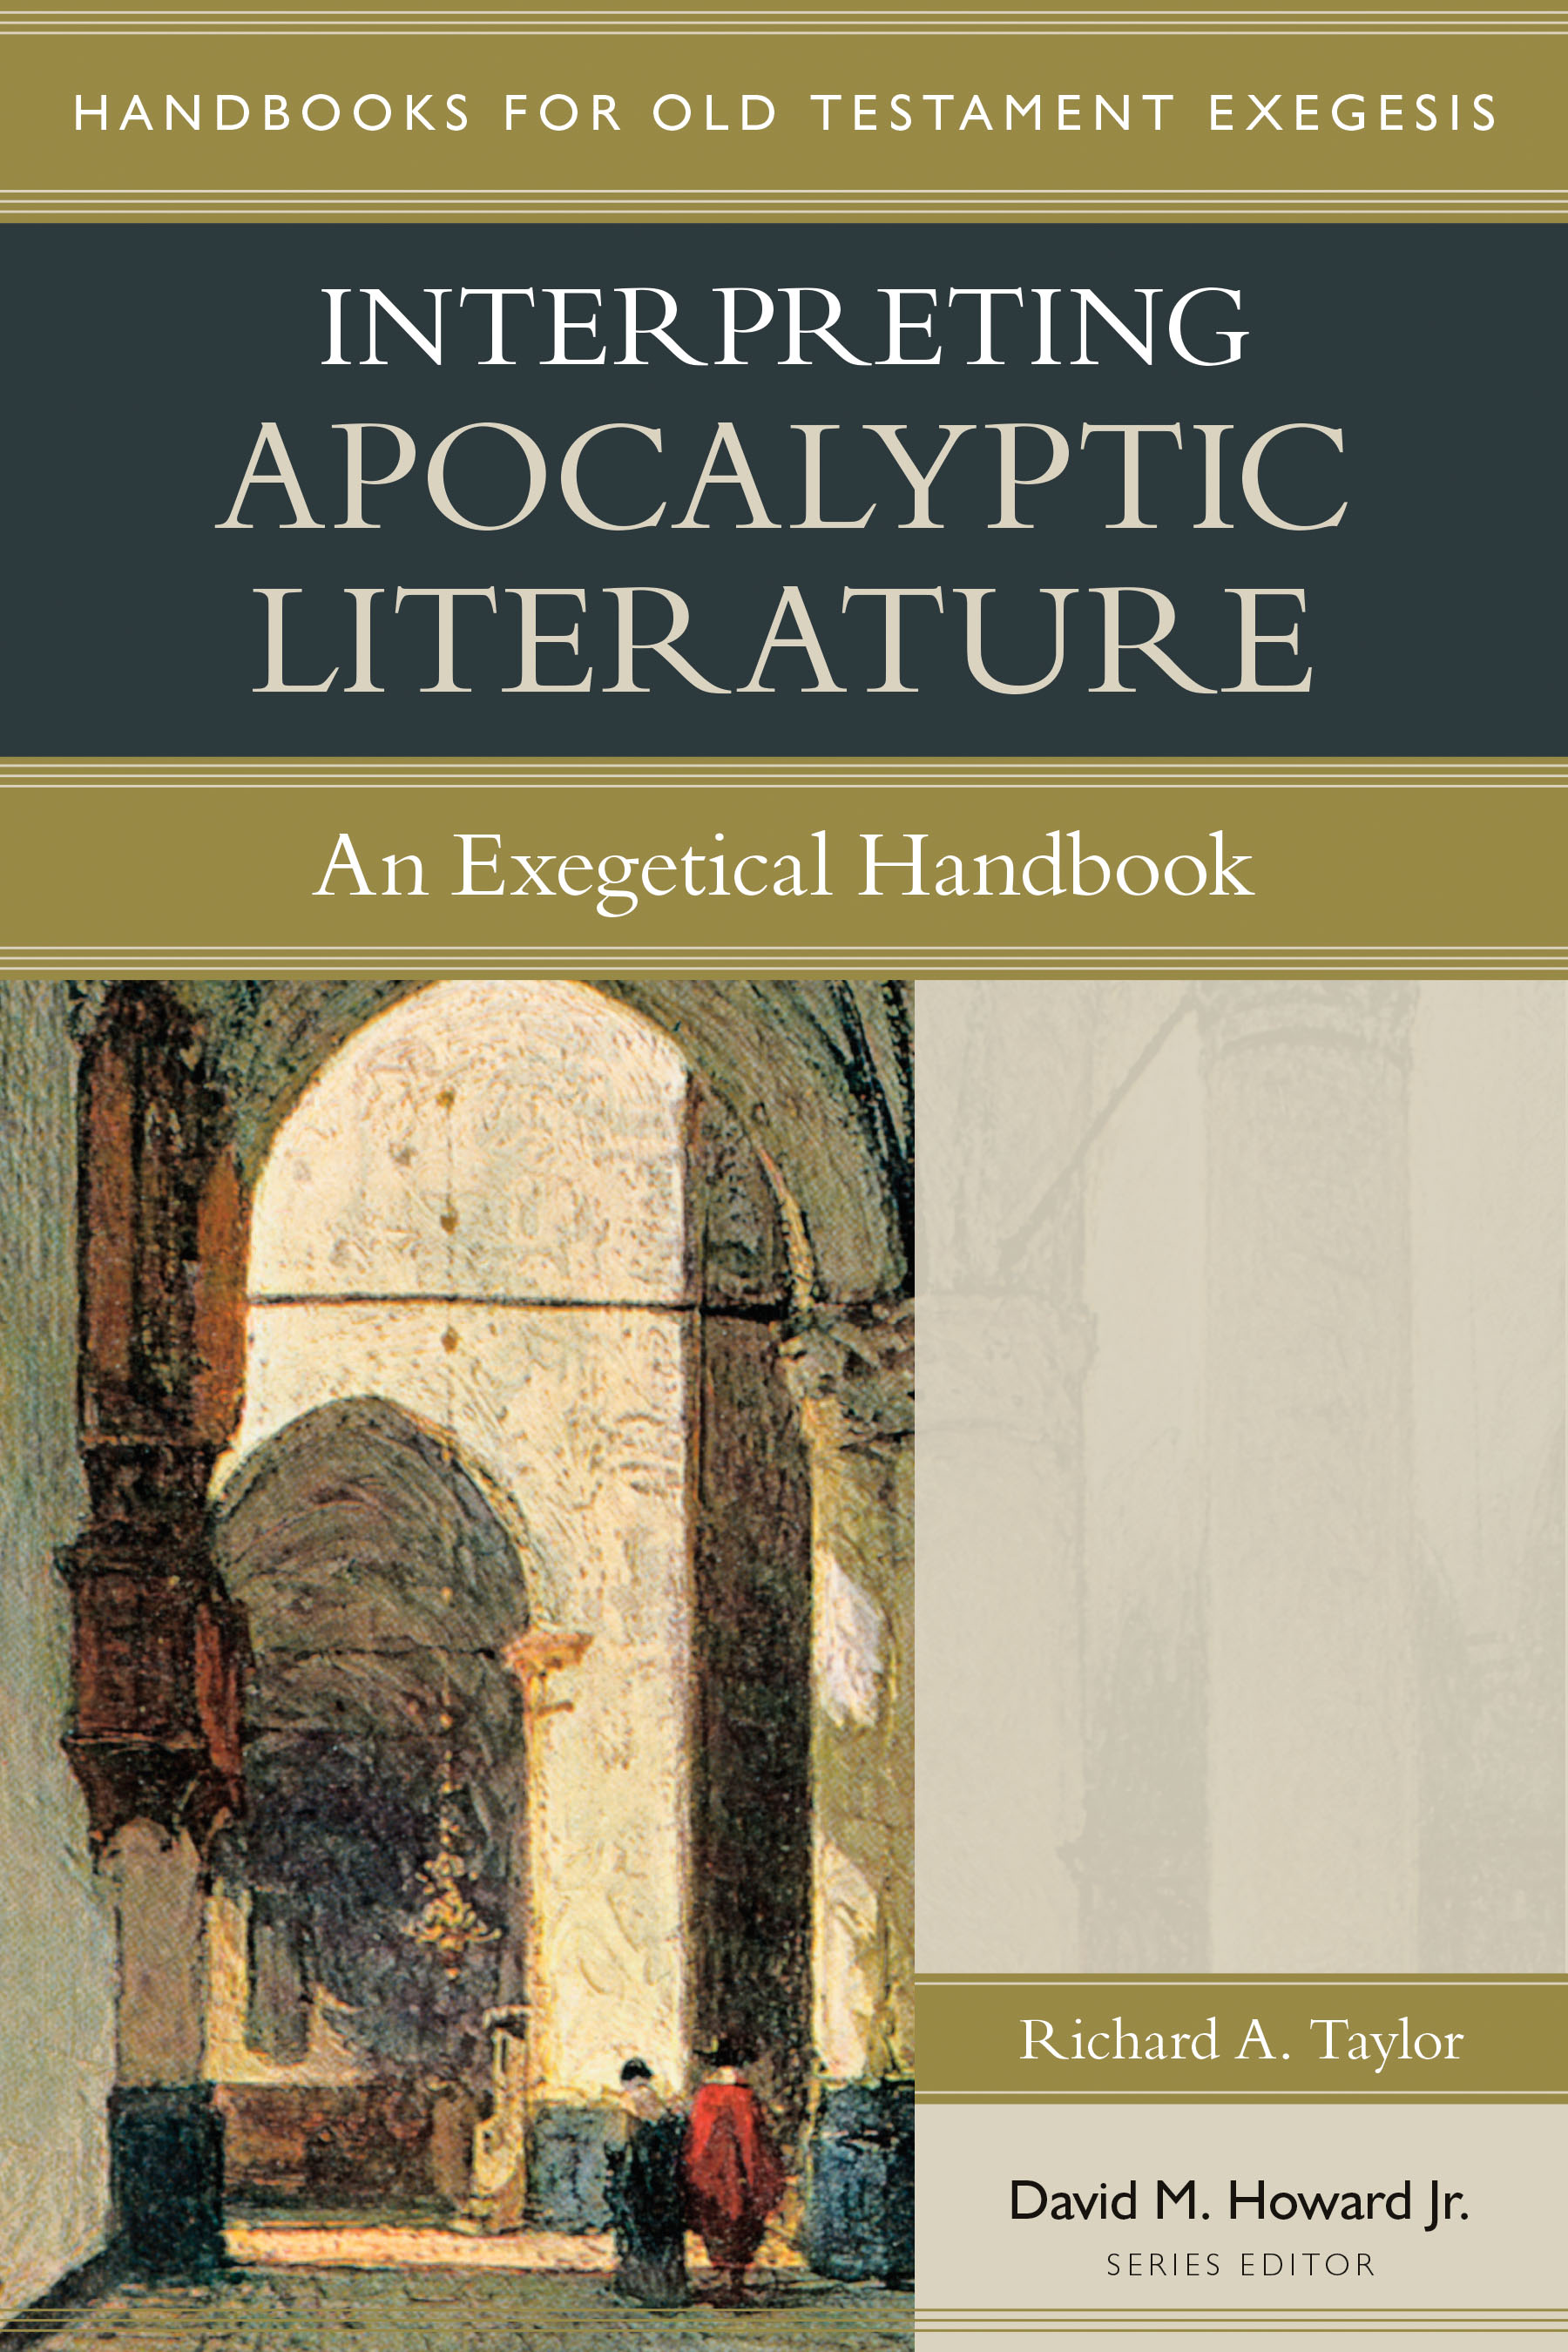 Interpreting Apocalyptic Literature